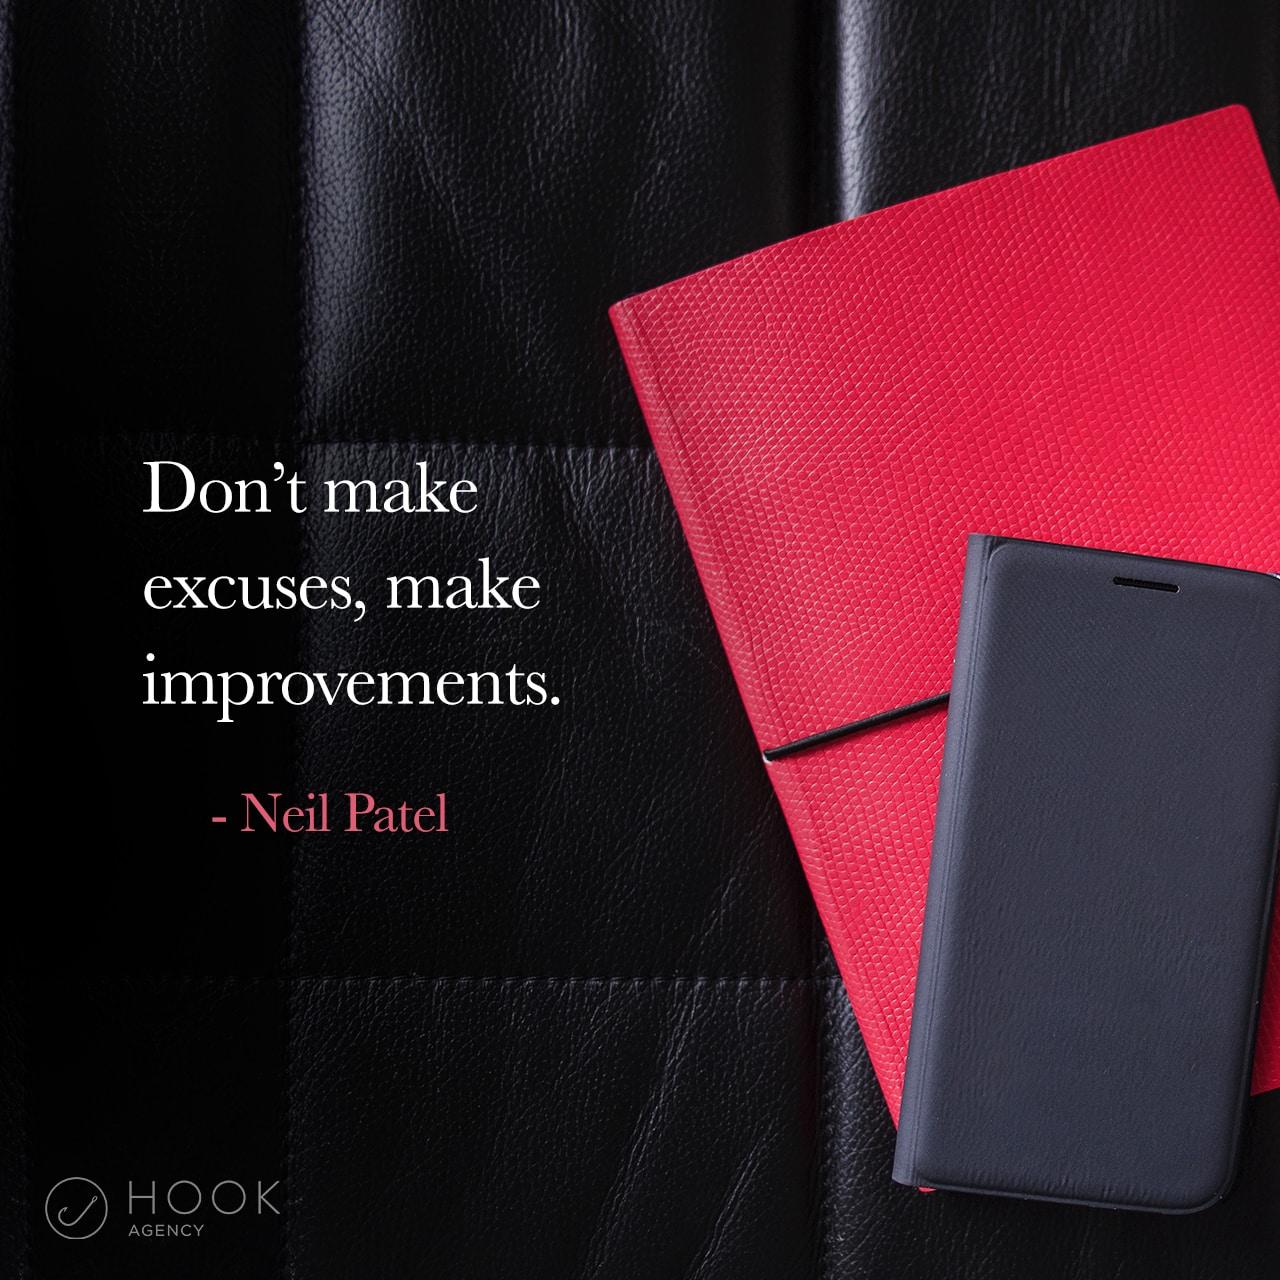 Don't make excuses, make improvements - Neil Patel